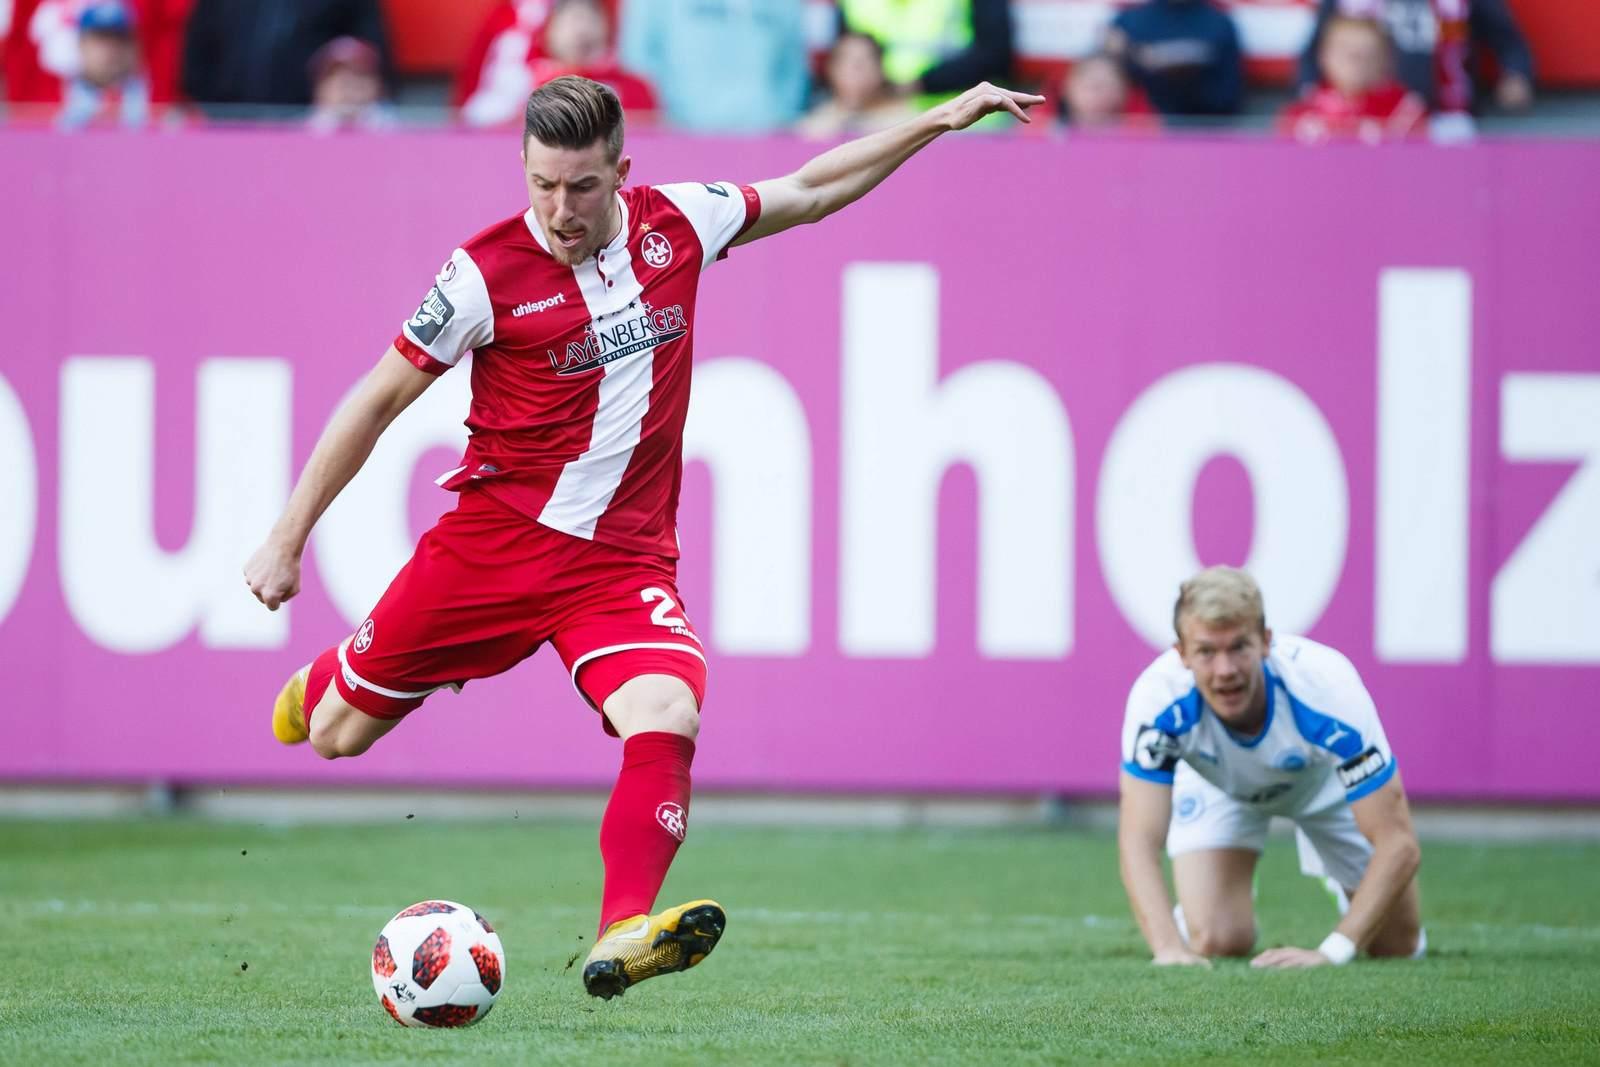 Christian Kühlwetter beim Torschuss für den 1. FC Kaiserslautern